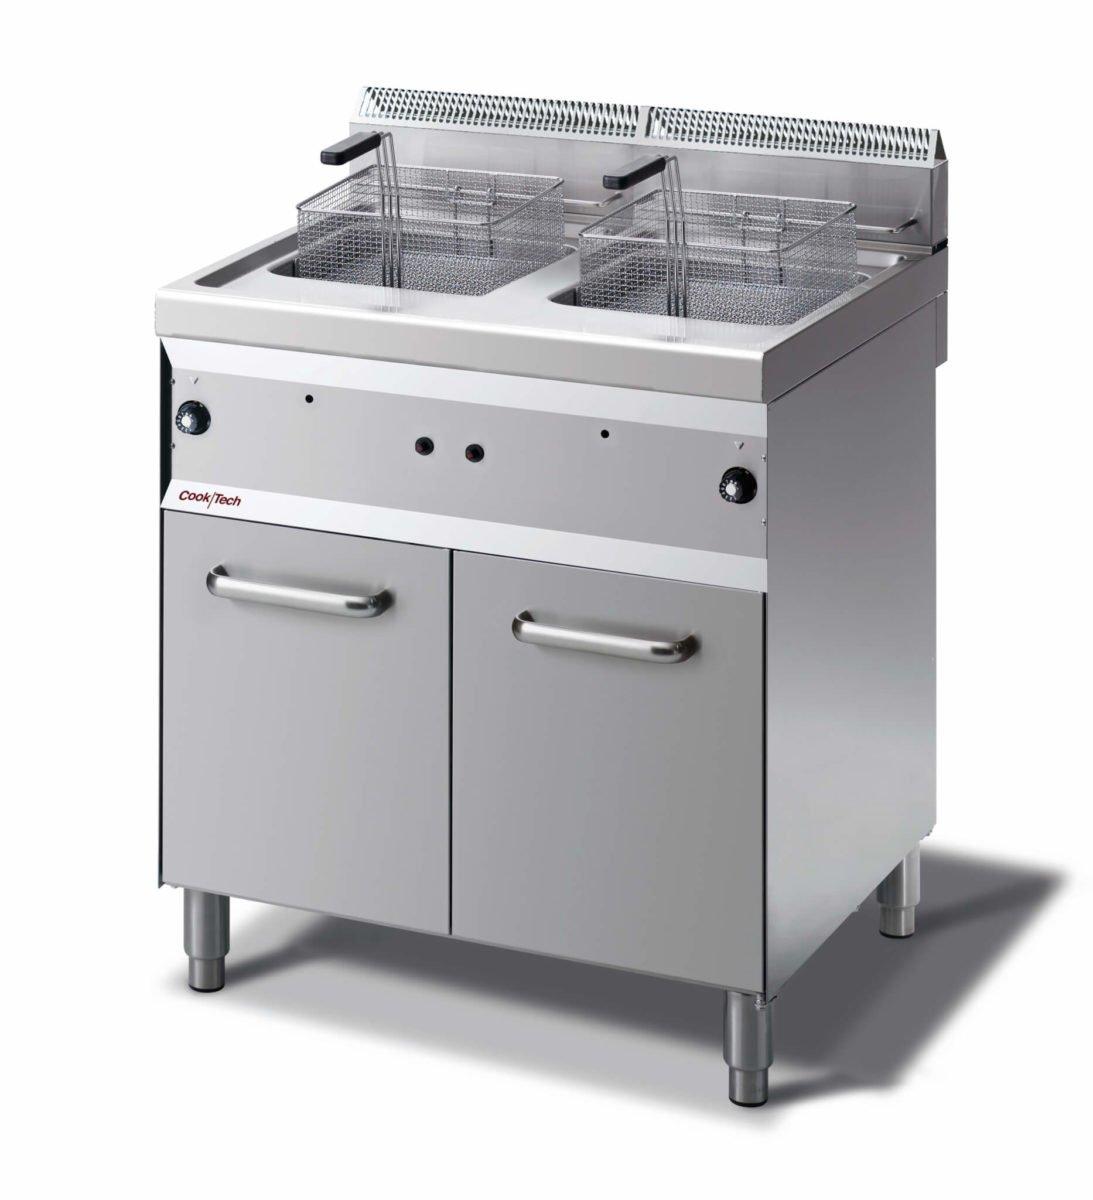 friggitrice-a-gas